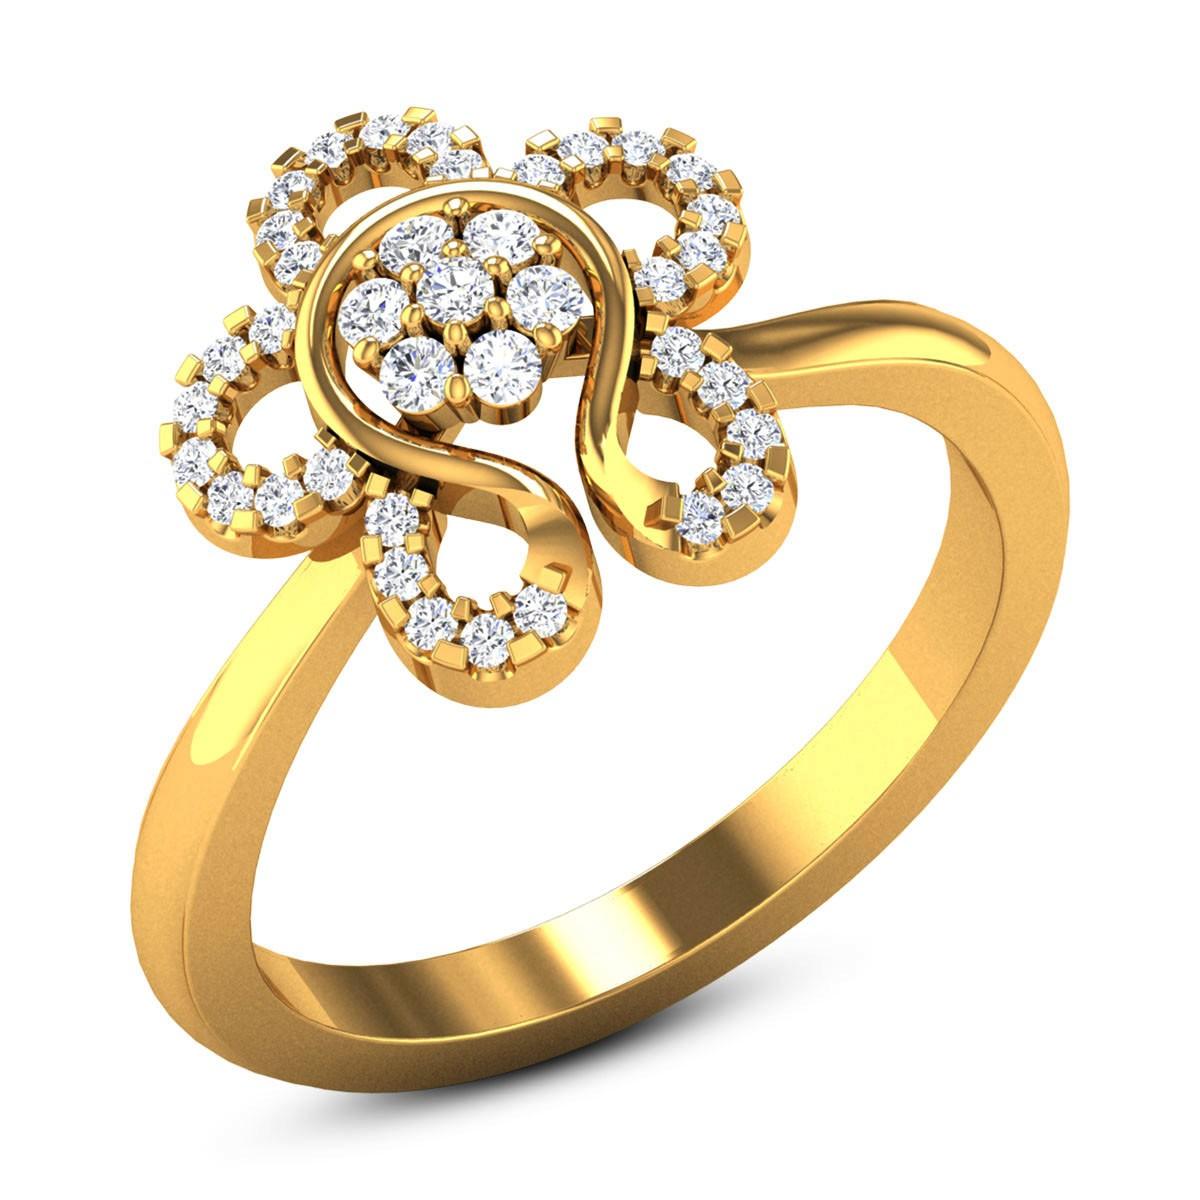 Halcyon Diamond Floral Ring